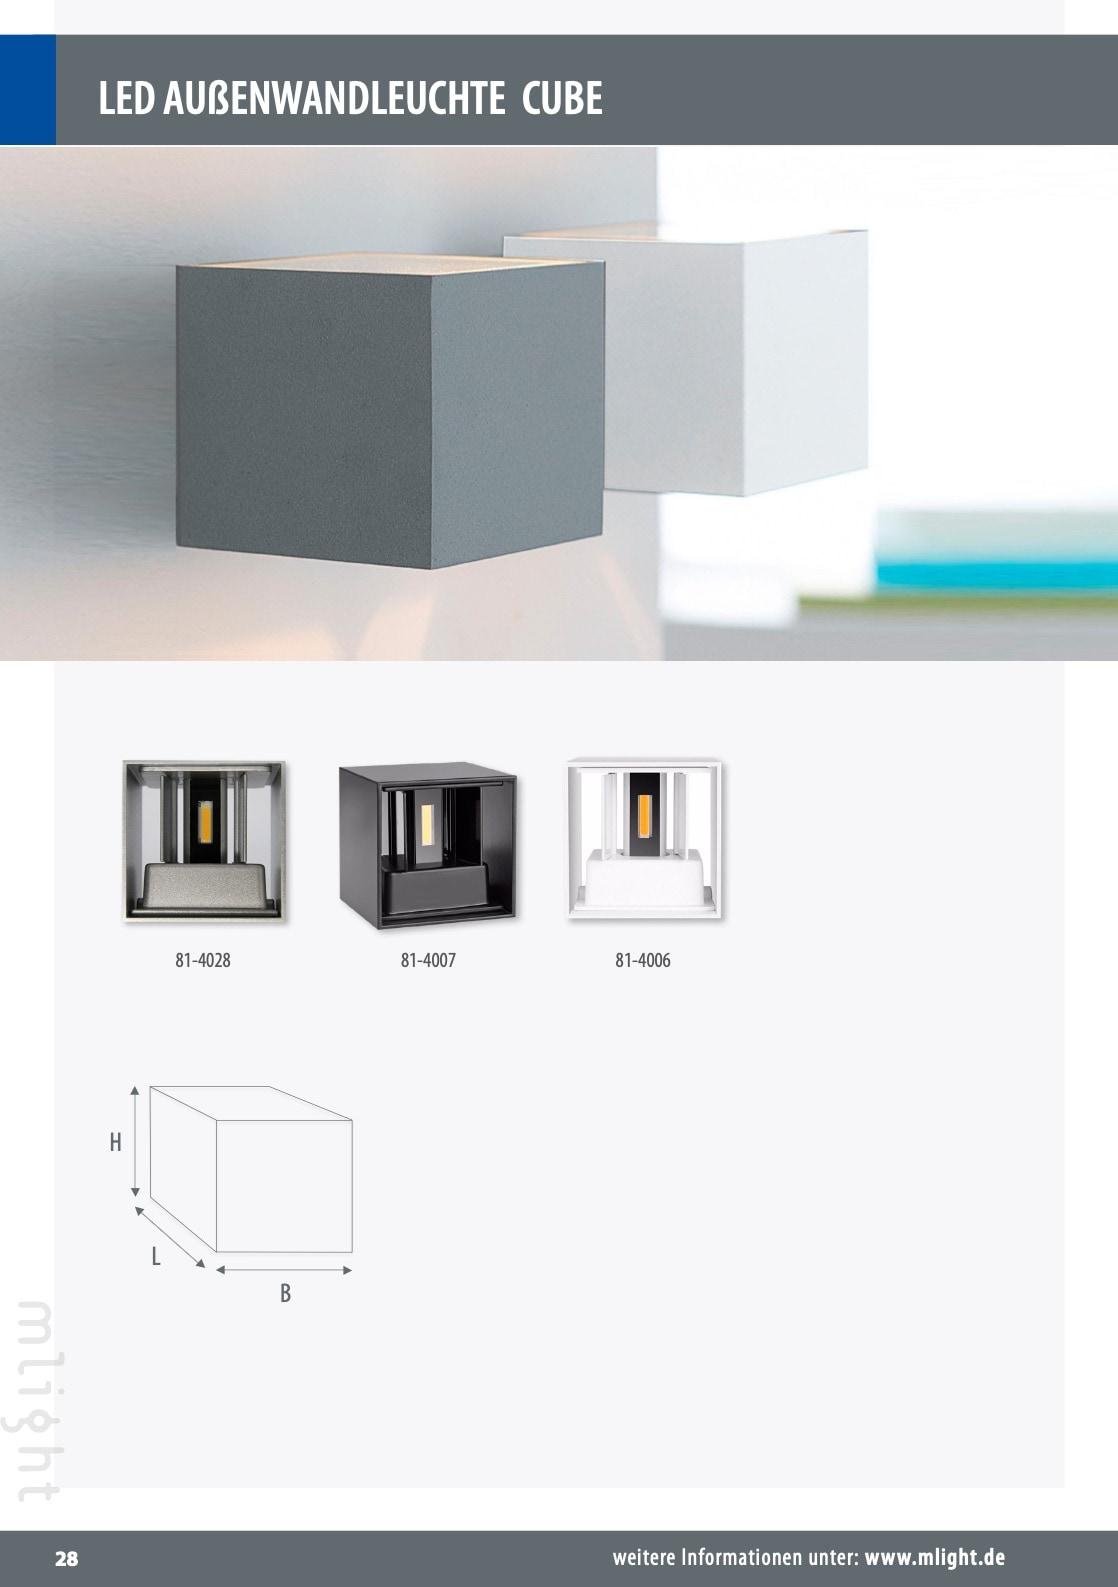 "M-Light LED Außenwandleuchte ""CUBE"" 6W 3000K 500lm 0-120° WInkel 100x100x100mm 81-4006"